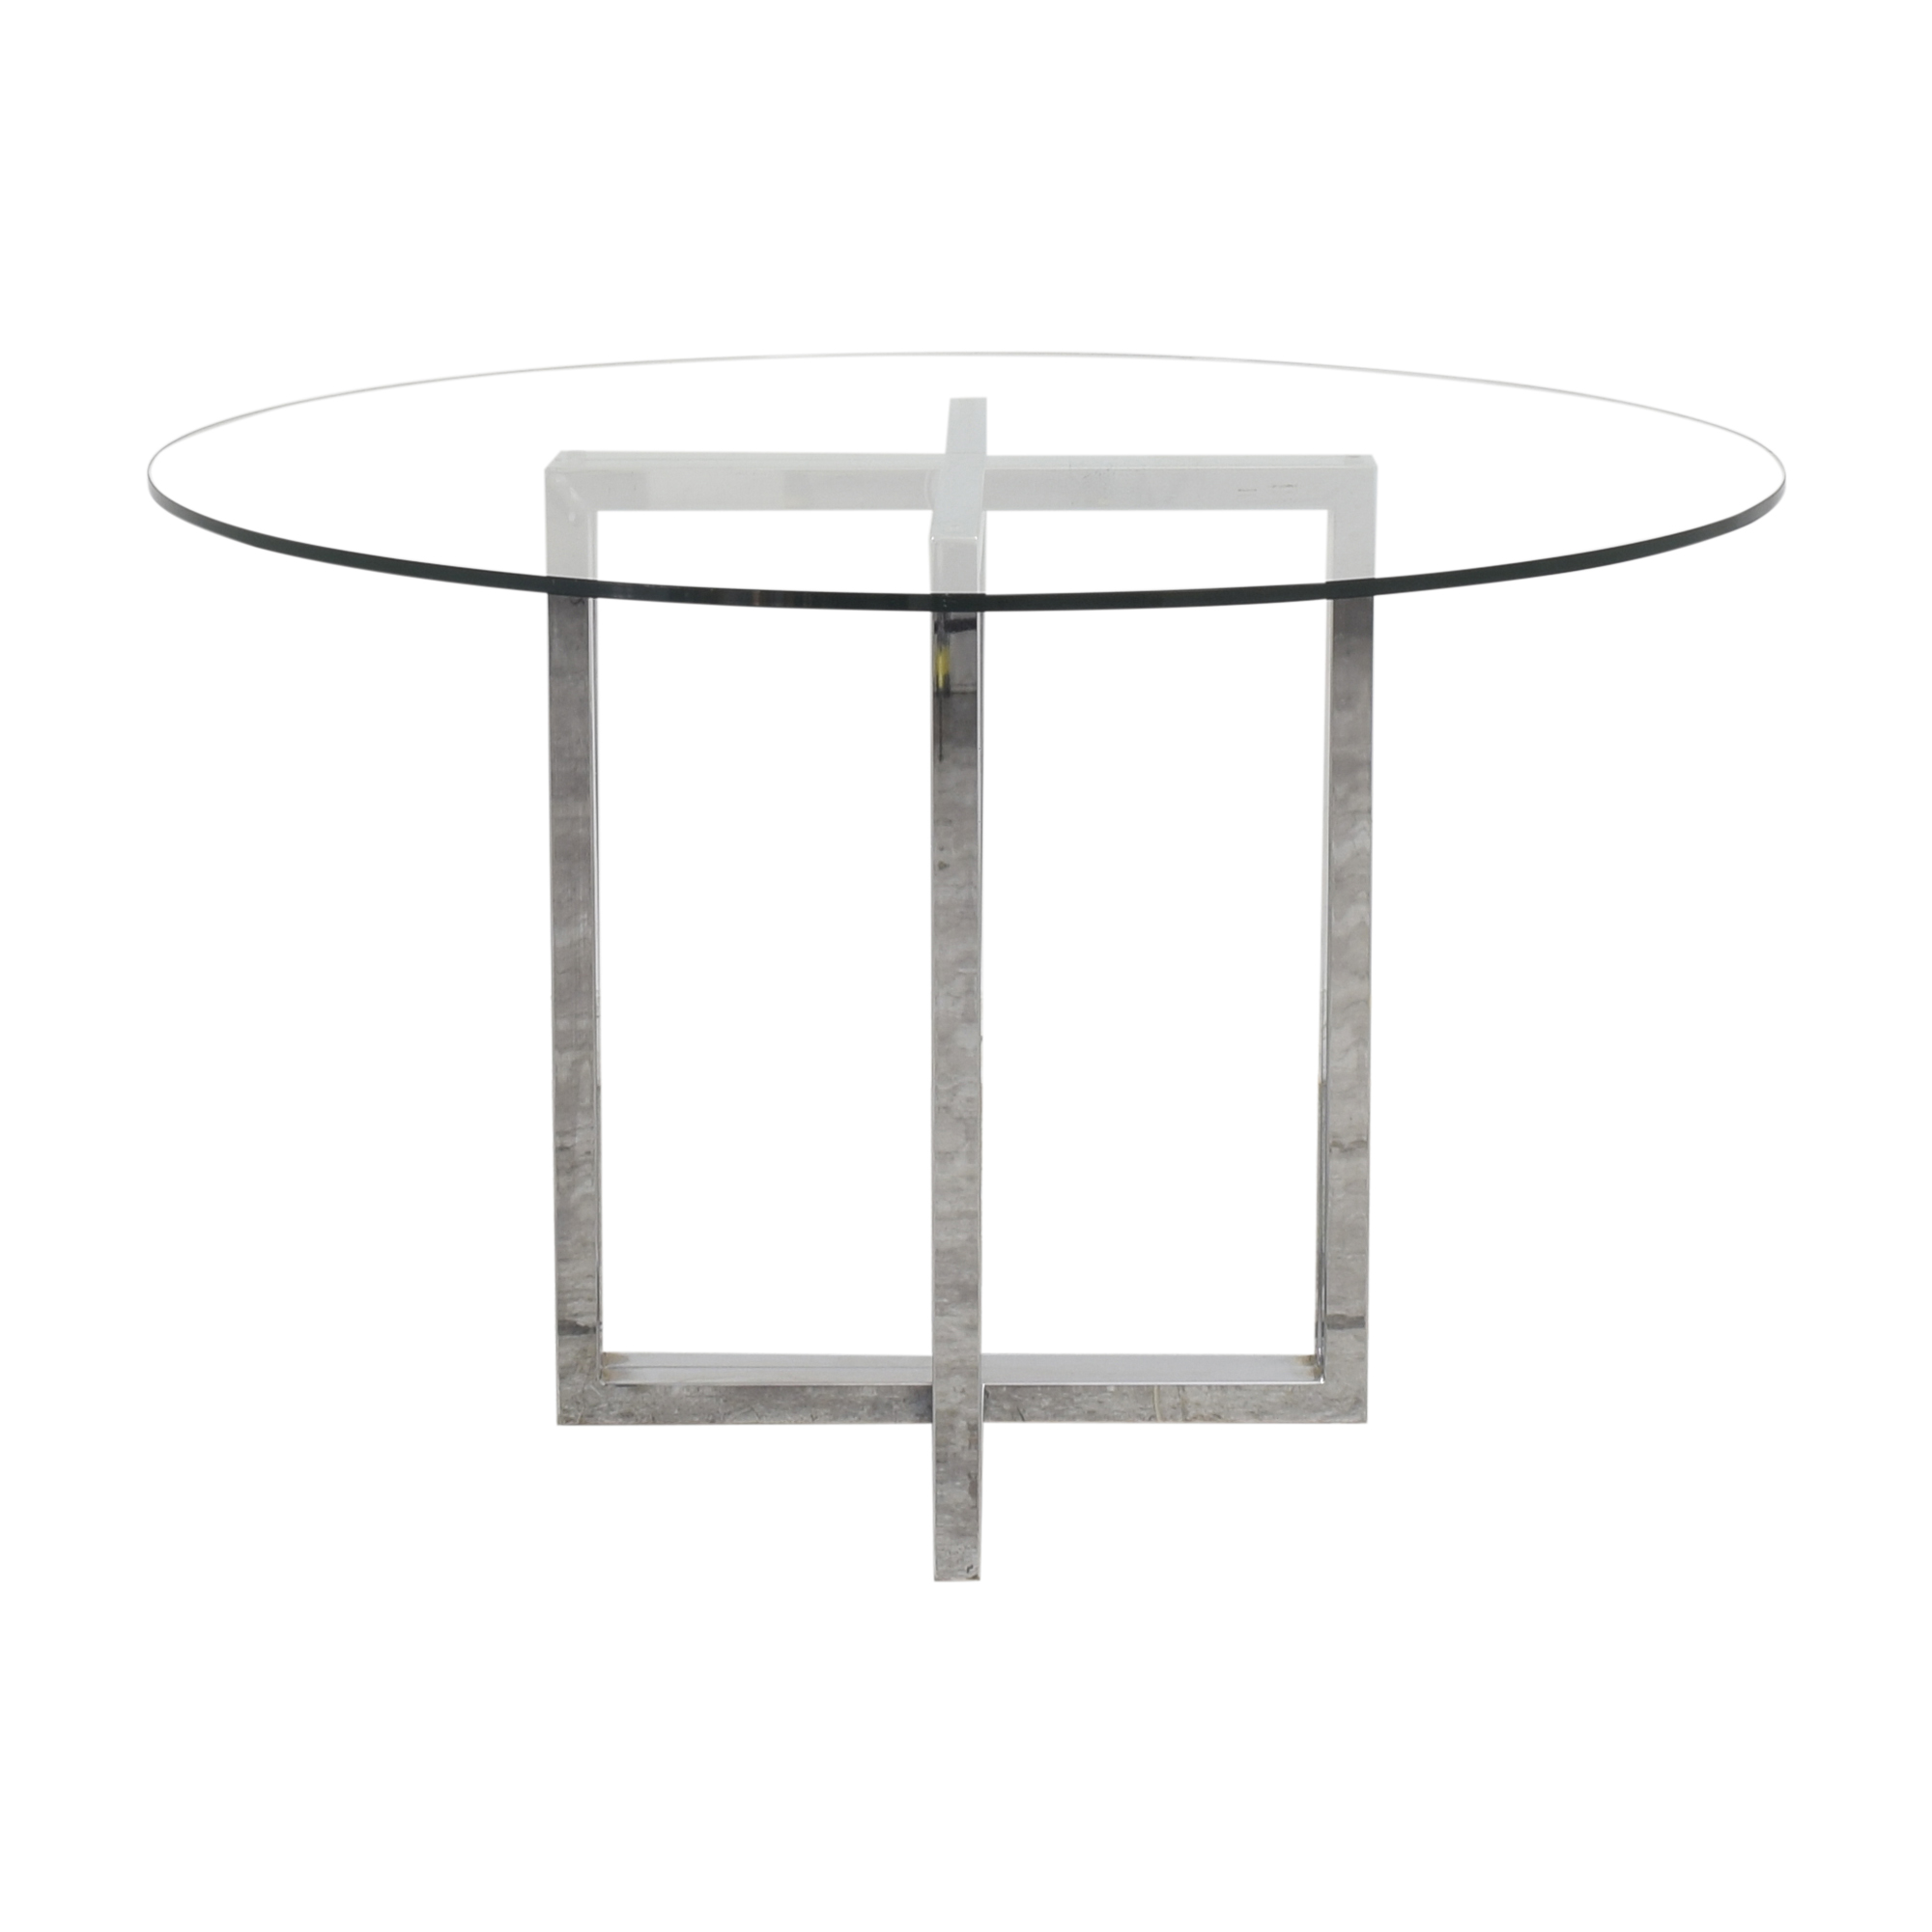 CB2 Silverado Table CB2